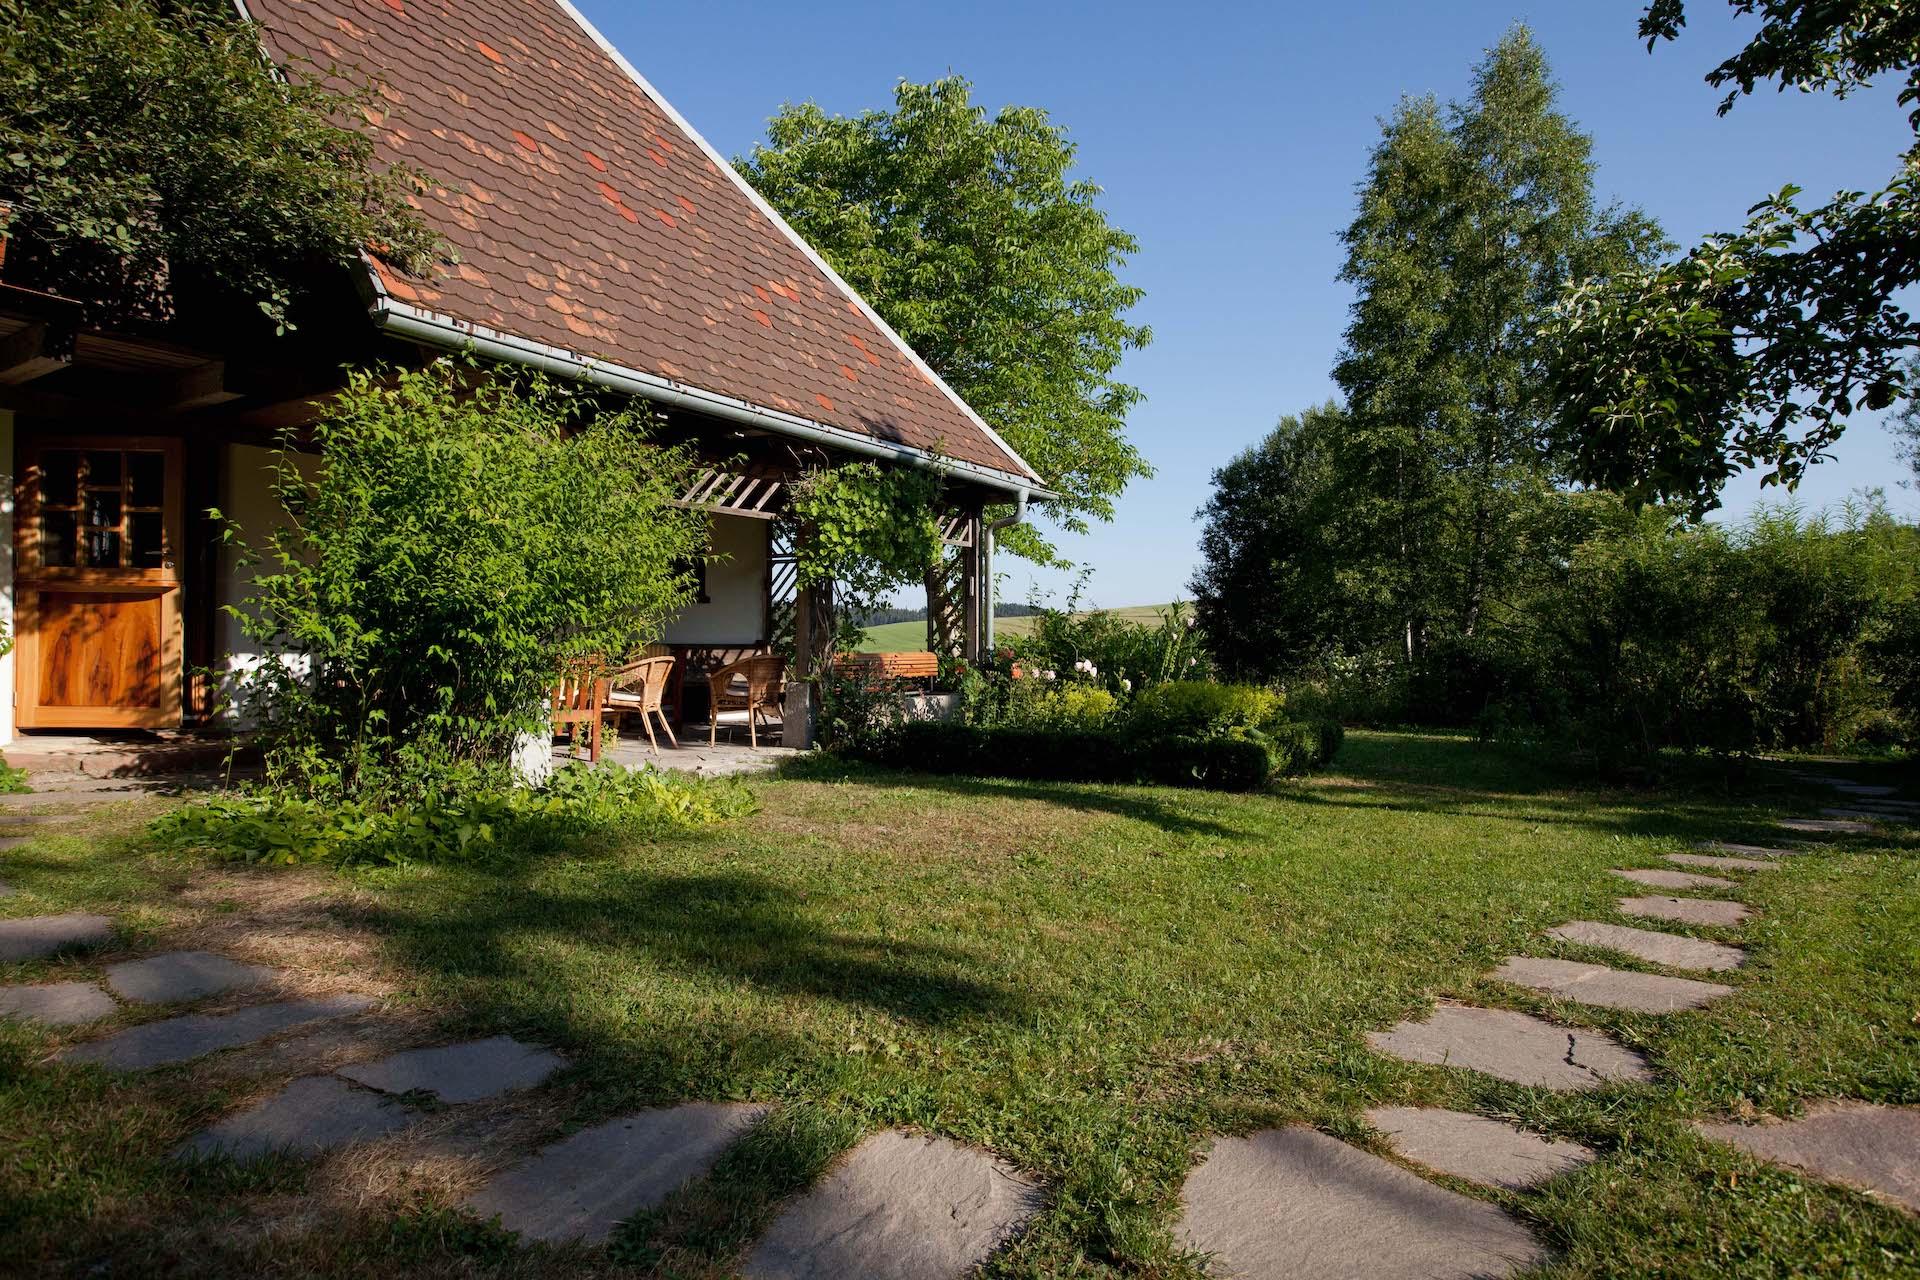 schwarzwald hotzenhaus sommer johanneshof zen meditation zazen buddhismus dharma sangha